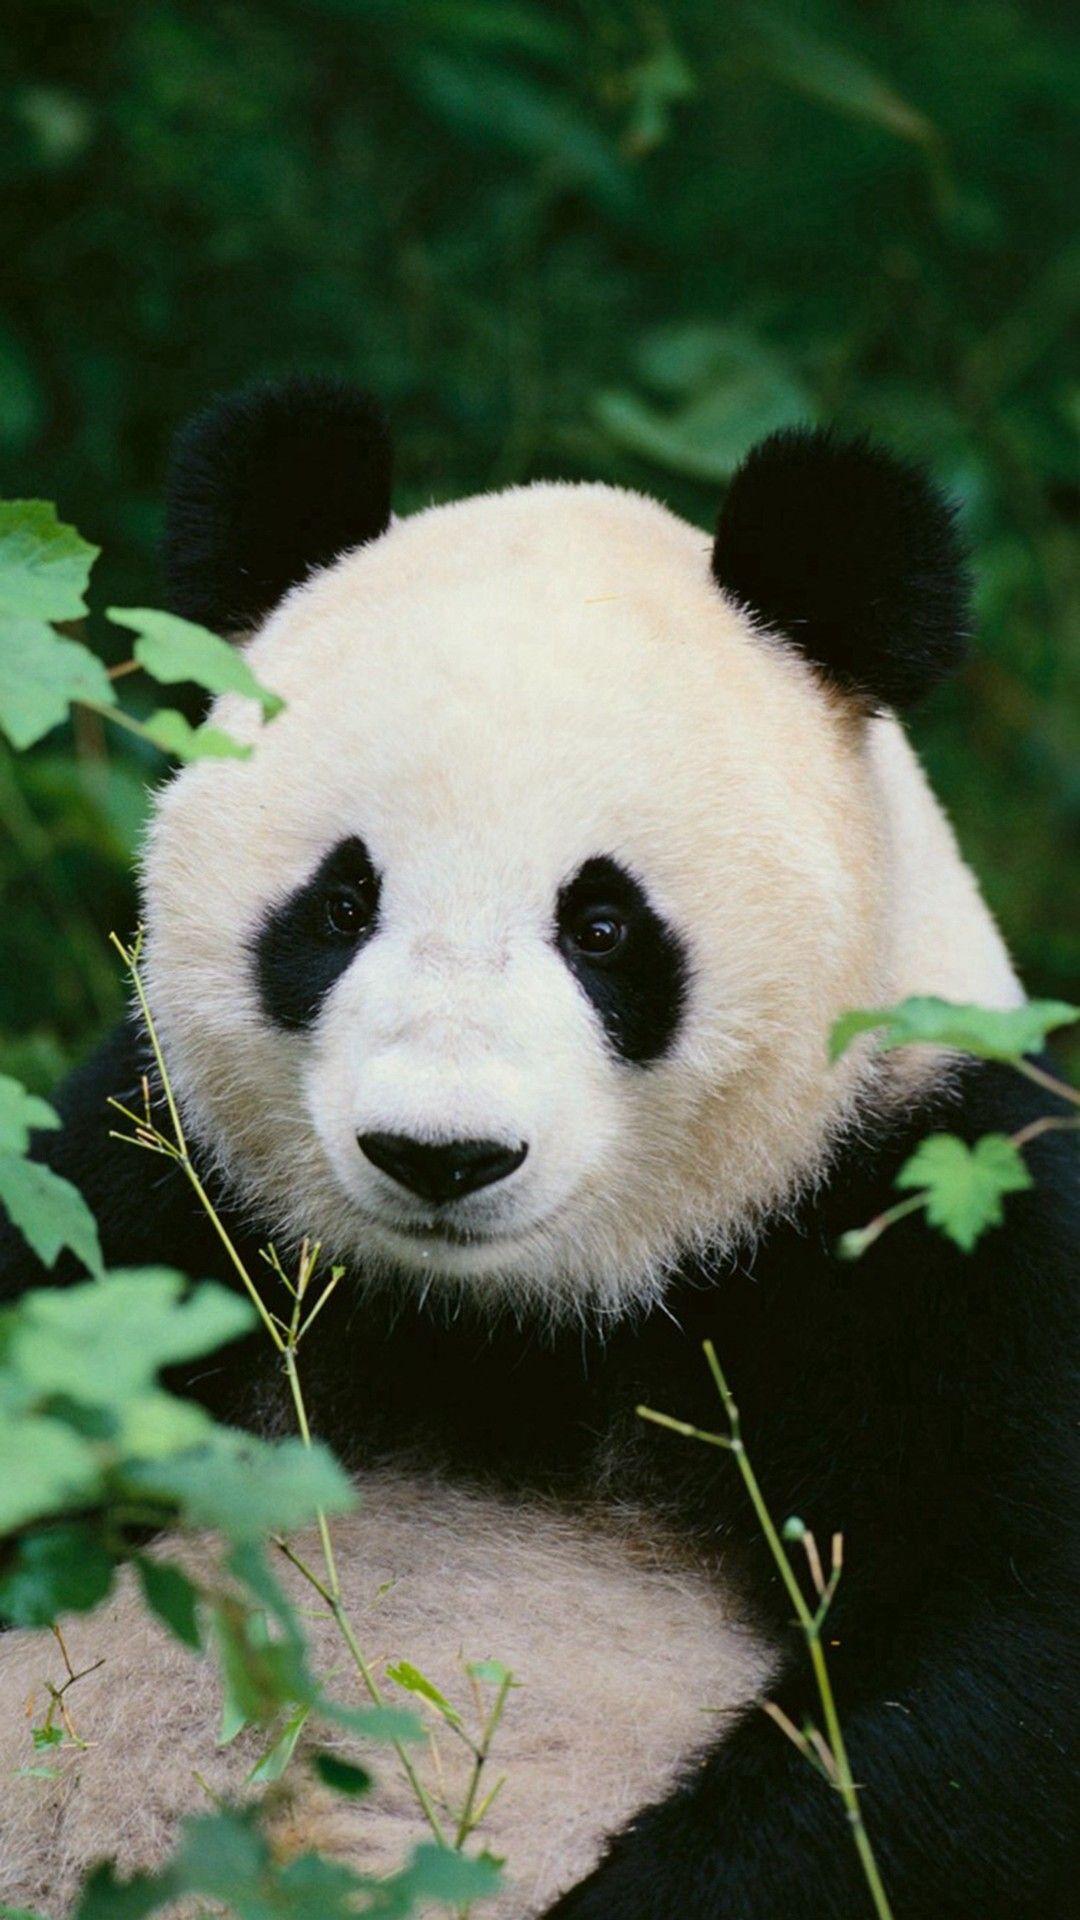 Panda Wallpaper Hd In 2020 Panda Wallpapers Giant Panda Cute Panda Wallpaper